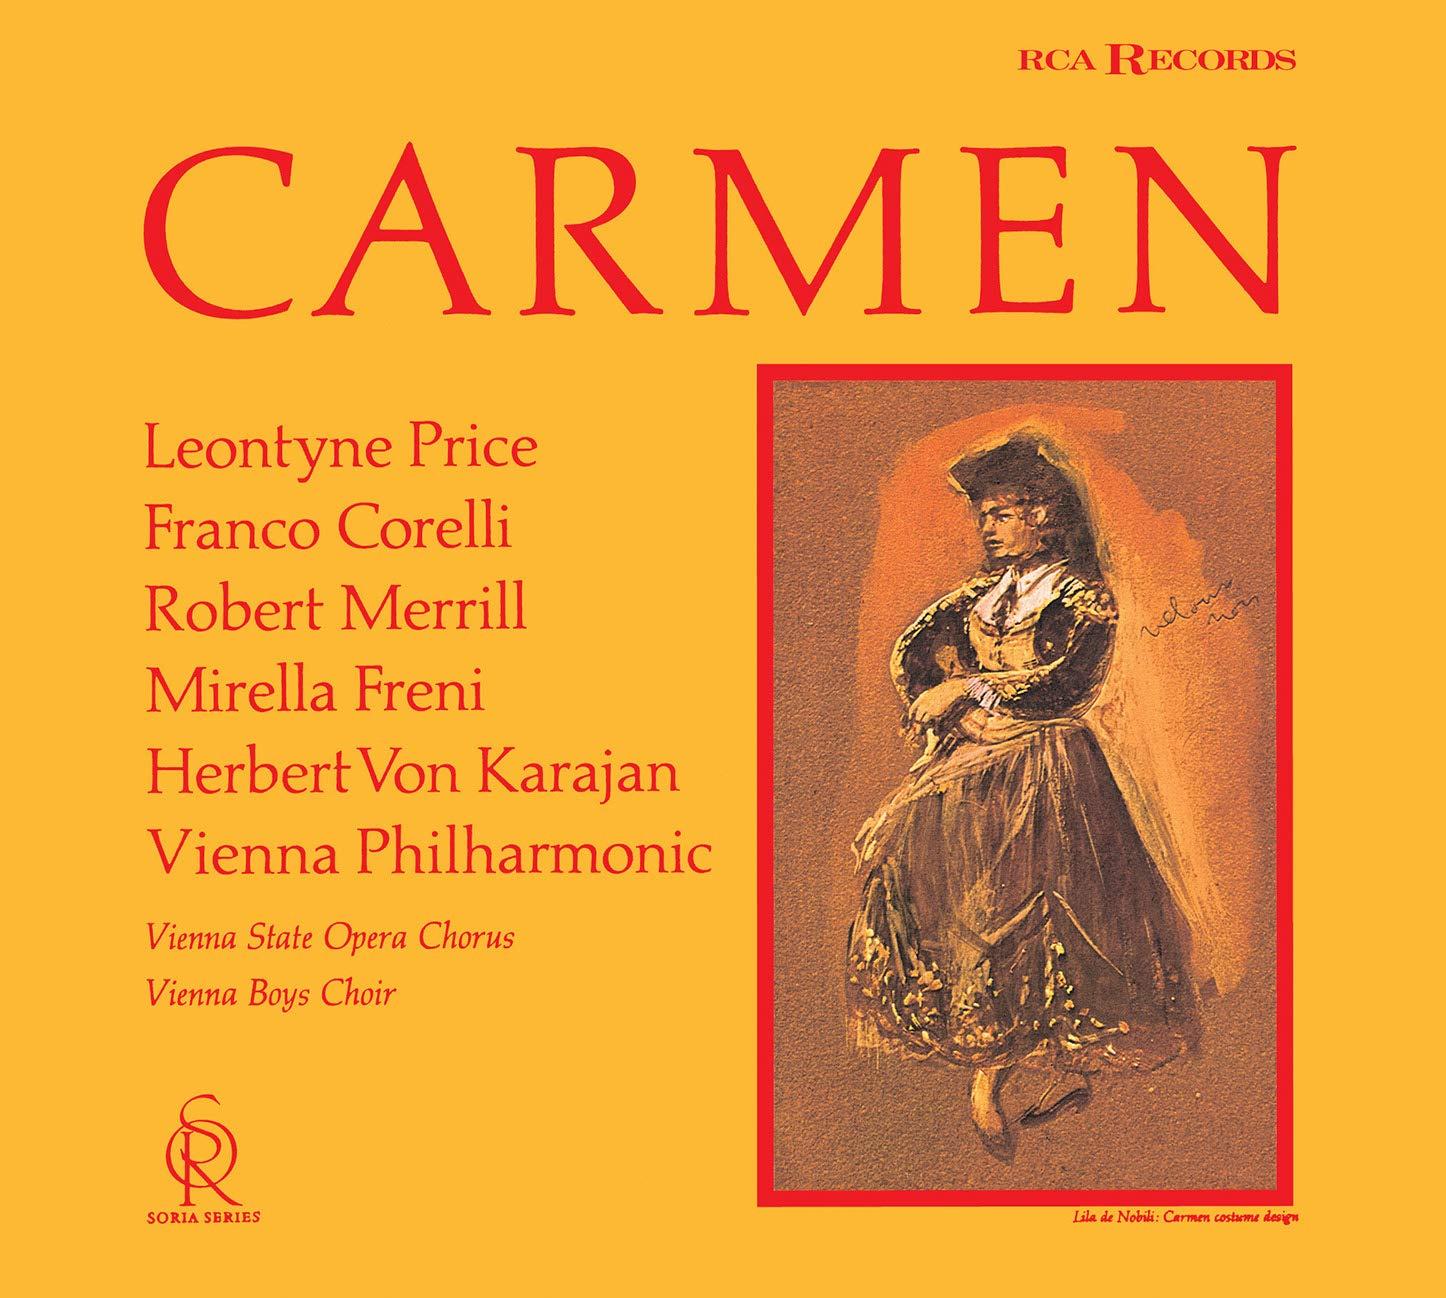 SACD : VON KARAJAN,HERBERT - Bizet: Carmen (Limited Edition, Direct Stream Digital, Japan - Import, Single Layer SACD)